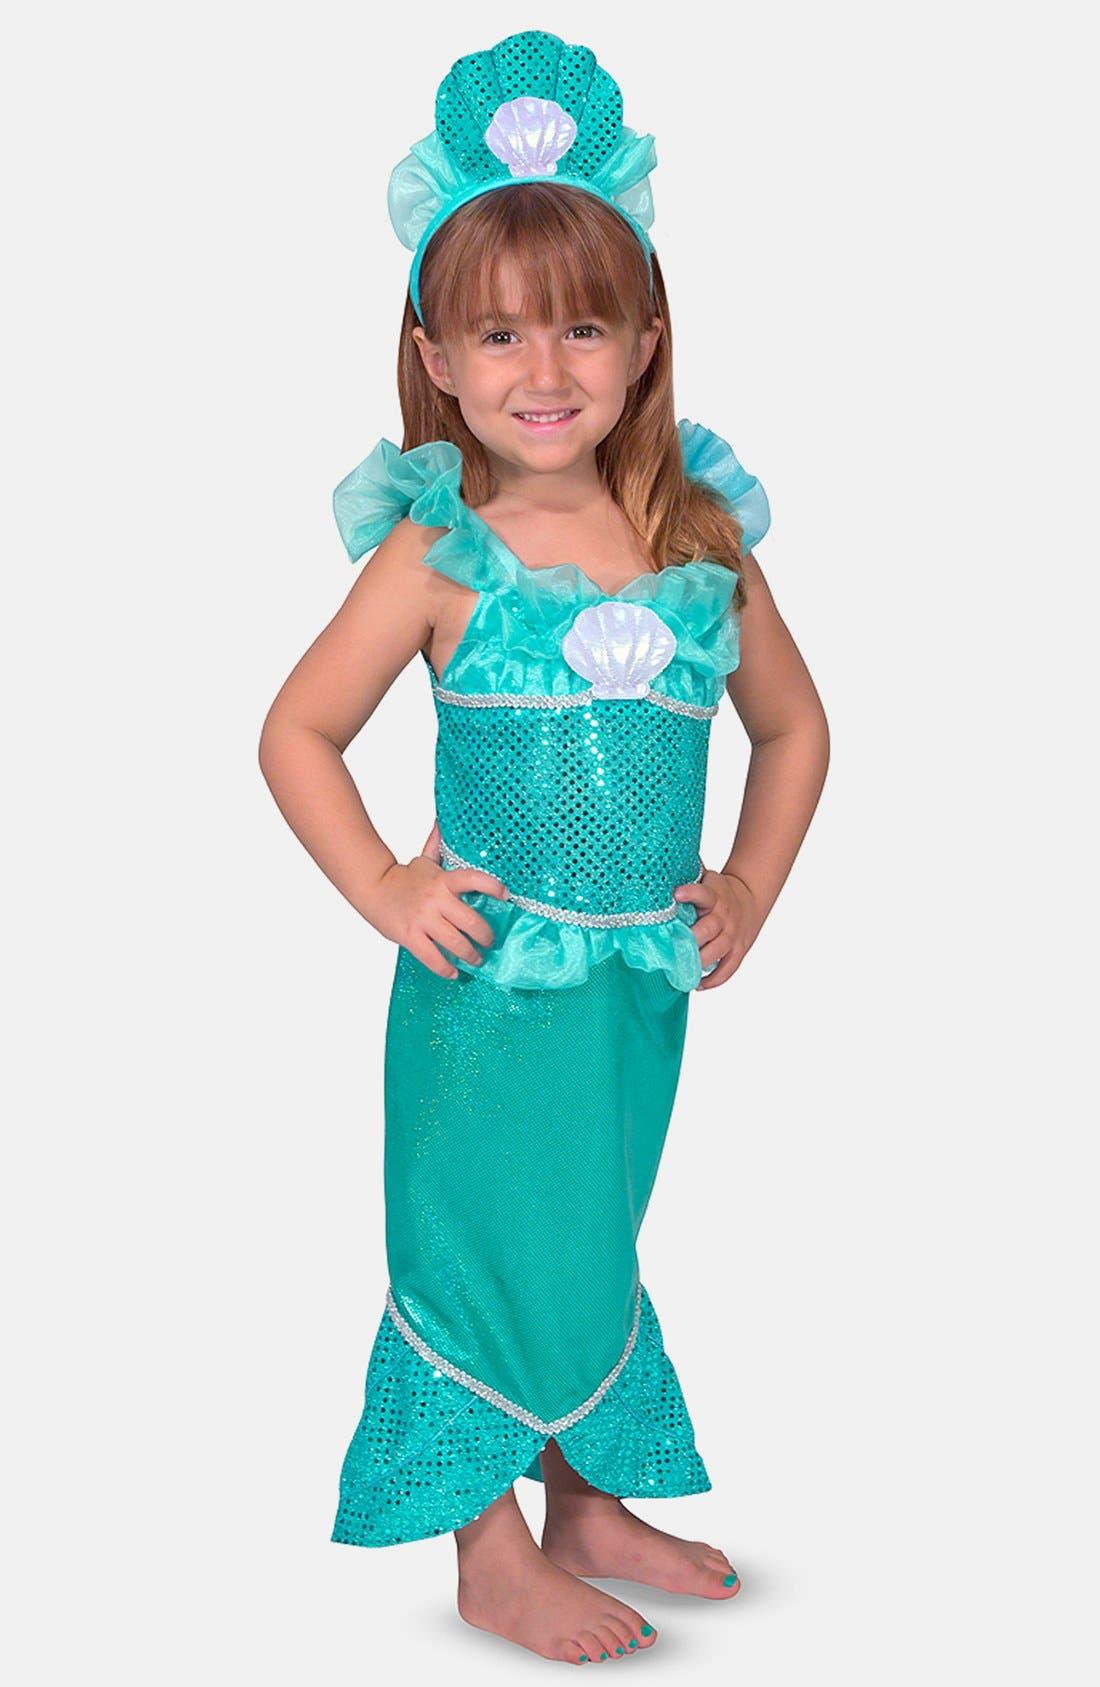 Mermaid Role Play Set,                             Main thumbnail 1, color,                             300